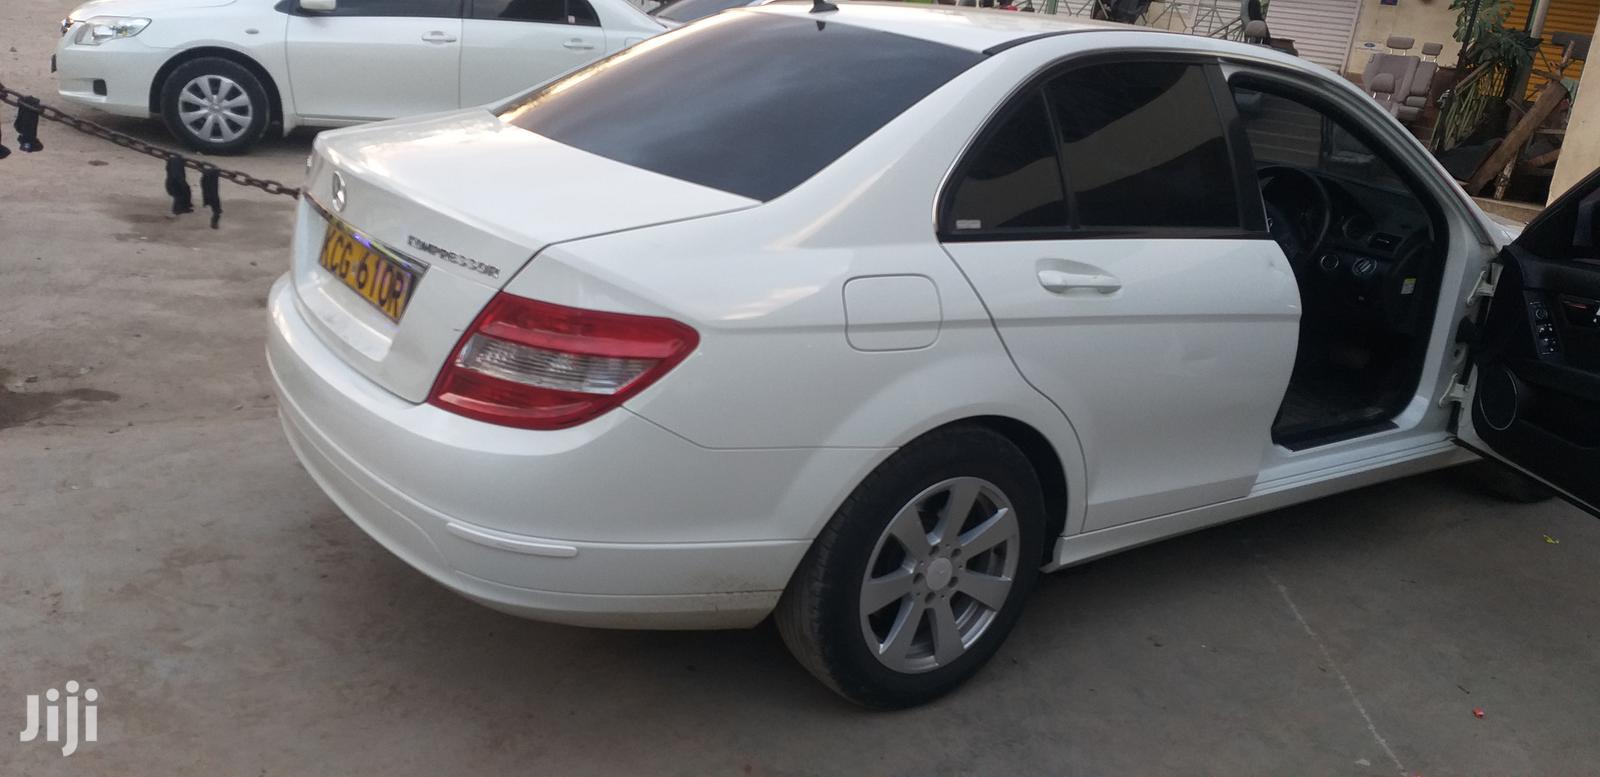 Archive: Mercedes-Benz 200 2008 White